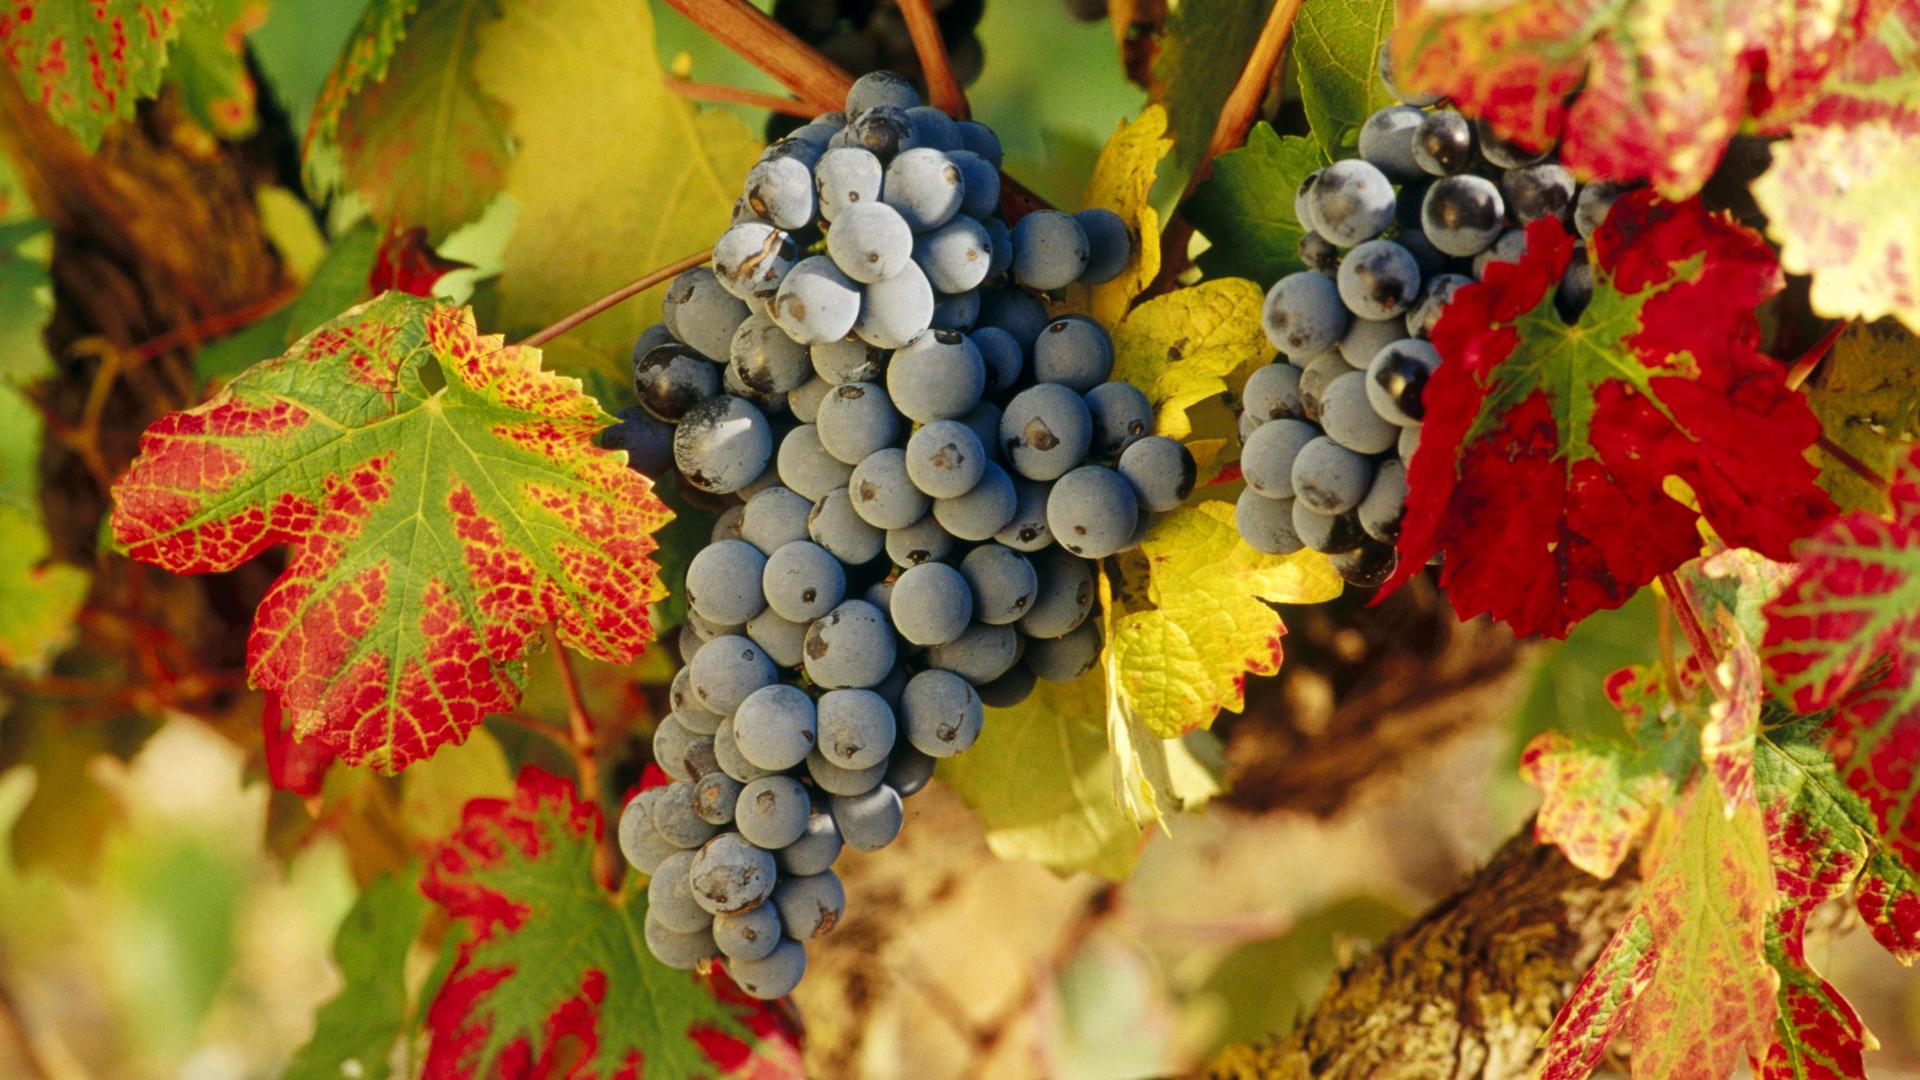 Harvest-Time-La-Rioja-Spain.jpg